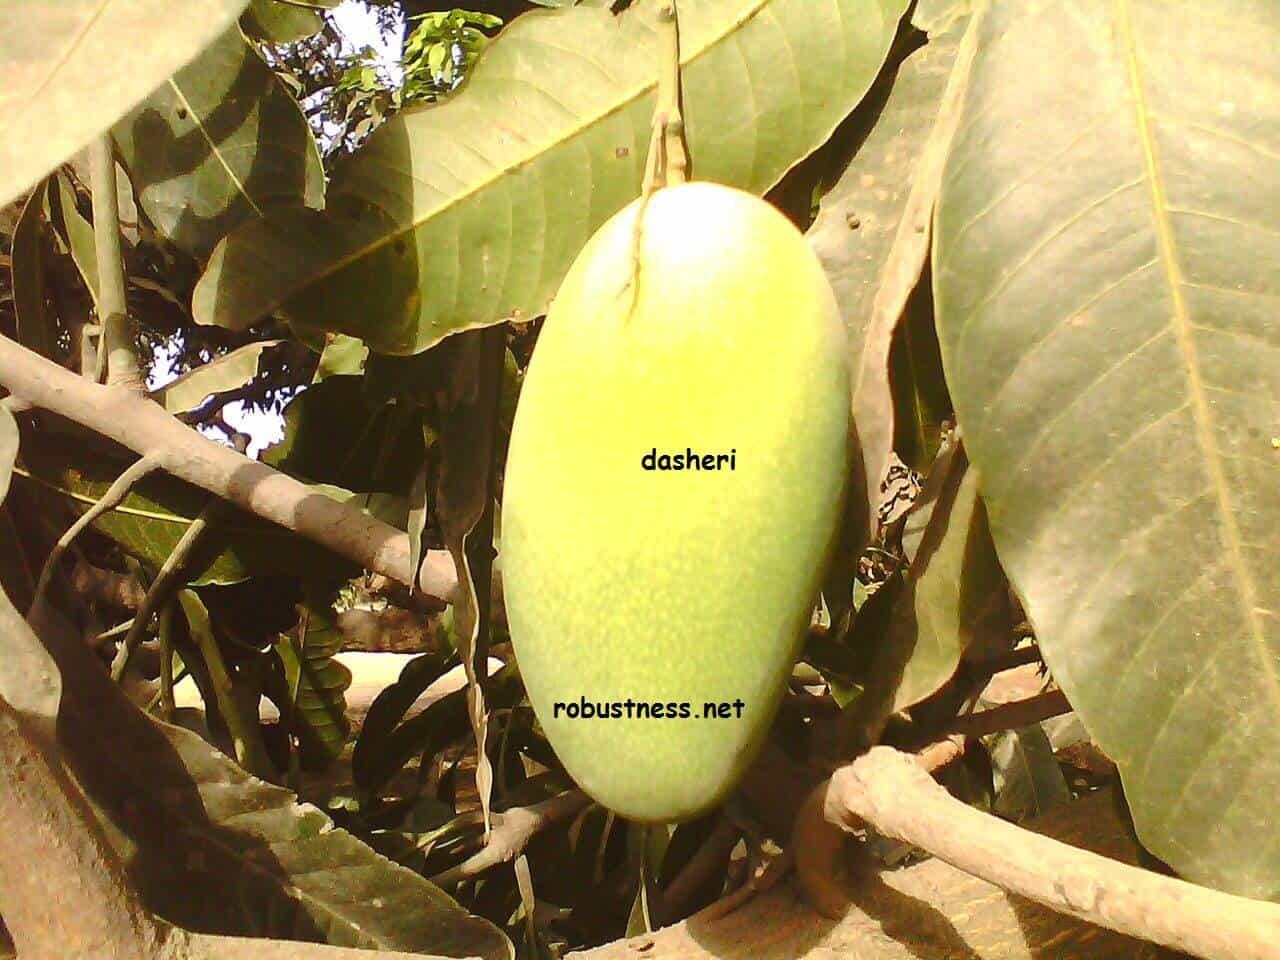 dasheri mango at the orchard